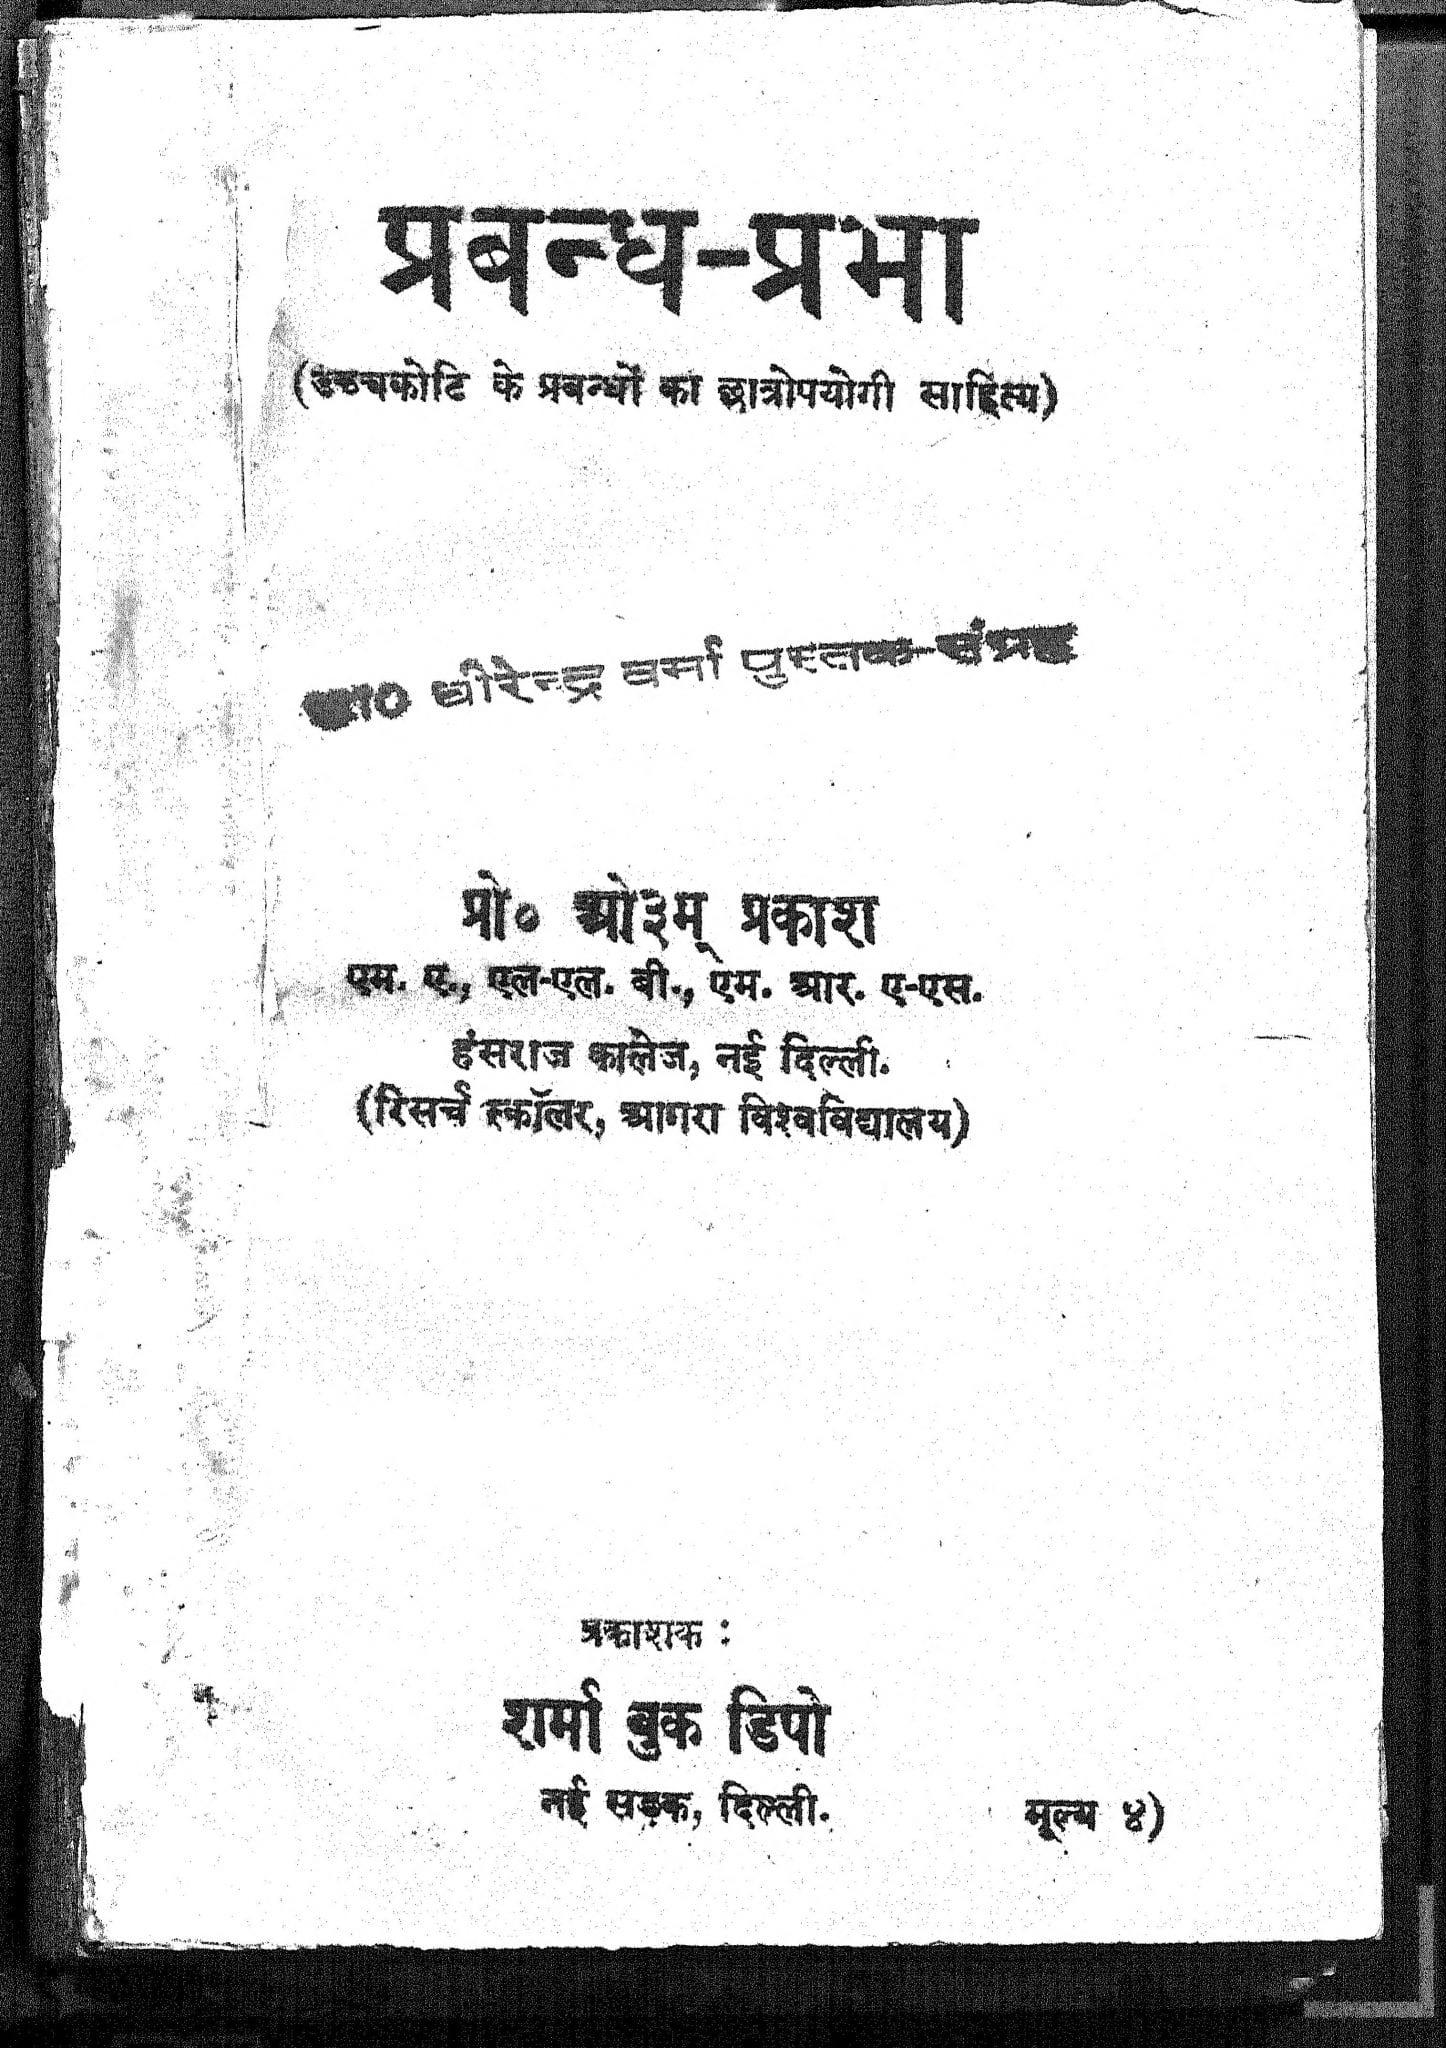 Book Image : प्रबन्ध - प्रभा - Prabandh-prahba